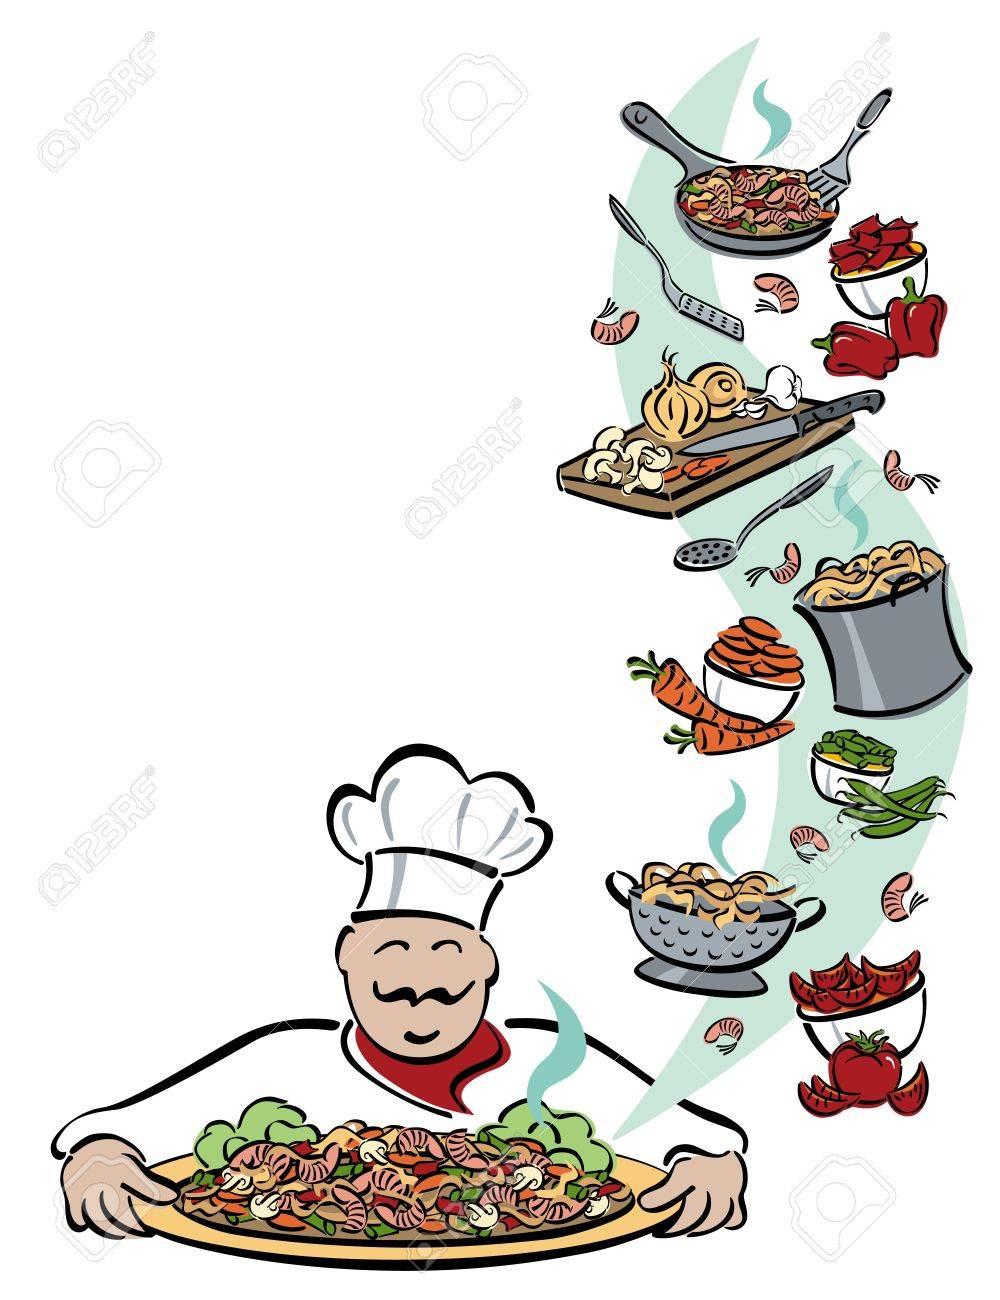 illustration of a chef presenting a platter of shrimp with pasta rh 123rf com Cherry Clip Art Steam Clip Art